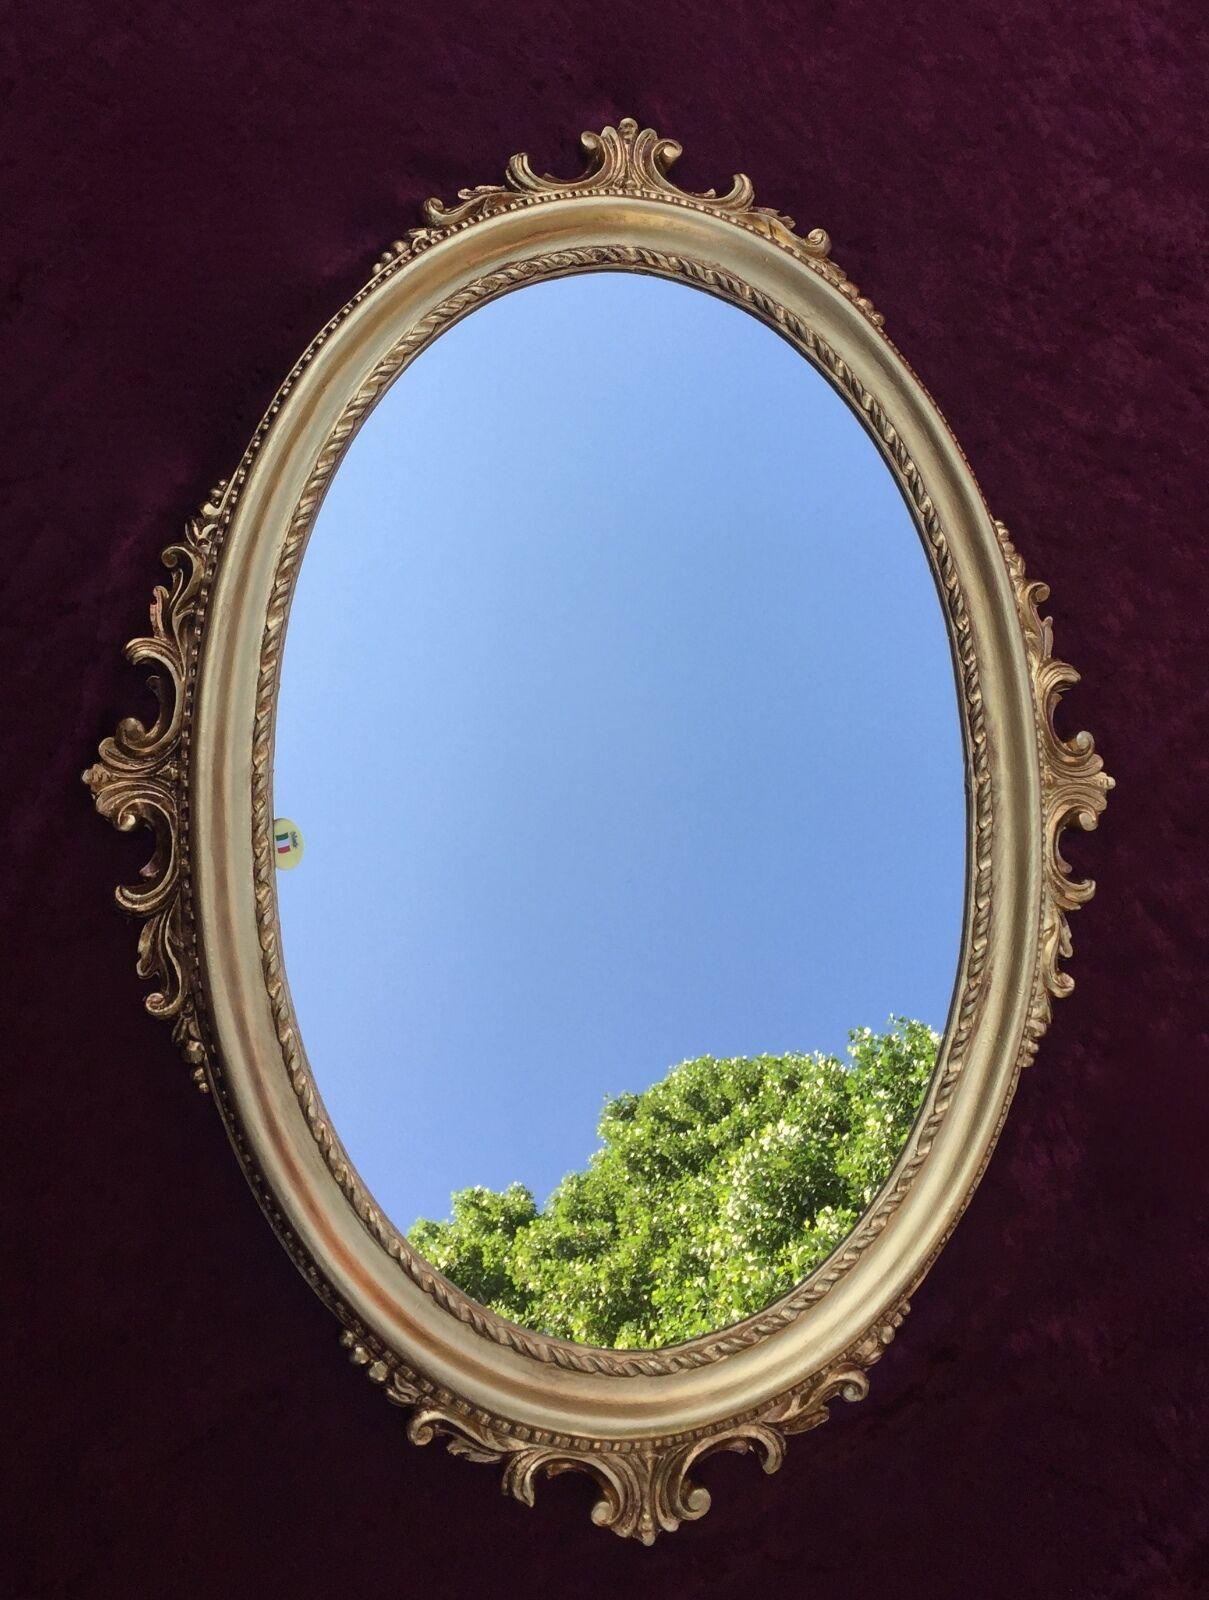 wandspiegel gold oval barock spiegel antik bad spiegel 62x48cm flurspiegel c12 kaufen bei. Black Bedroom Furniture Sets. Home Design Ideas